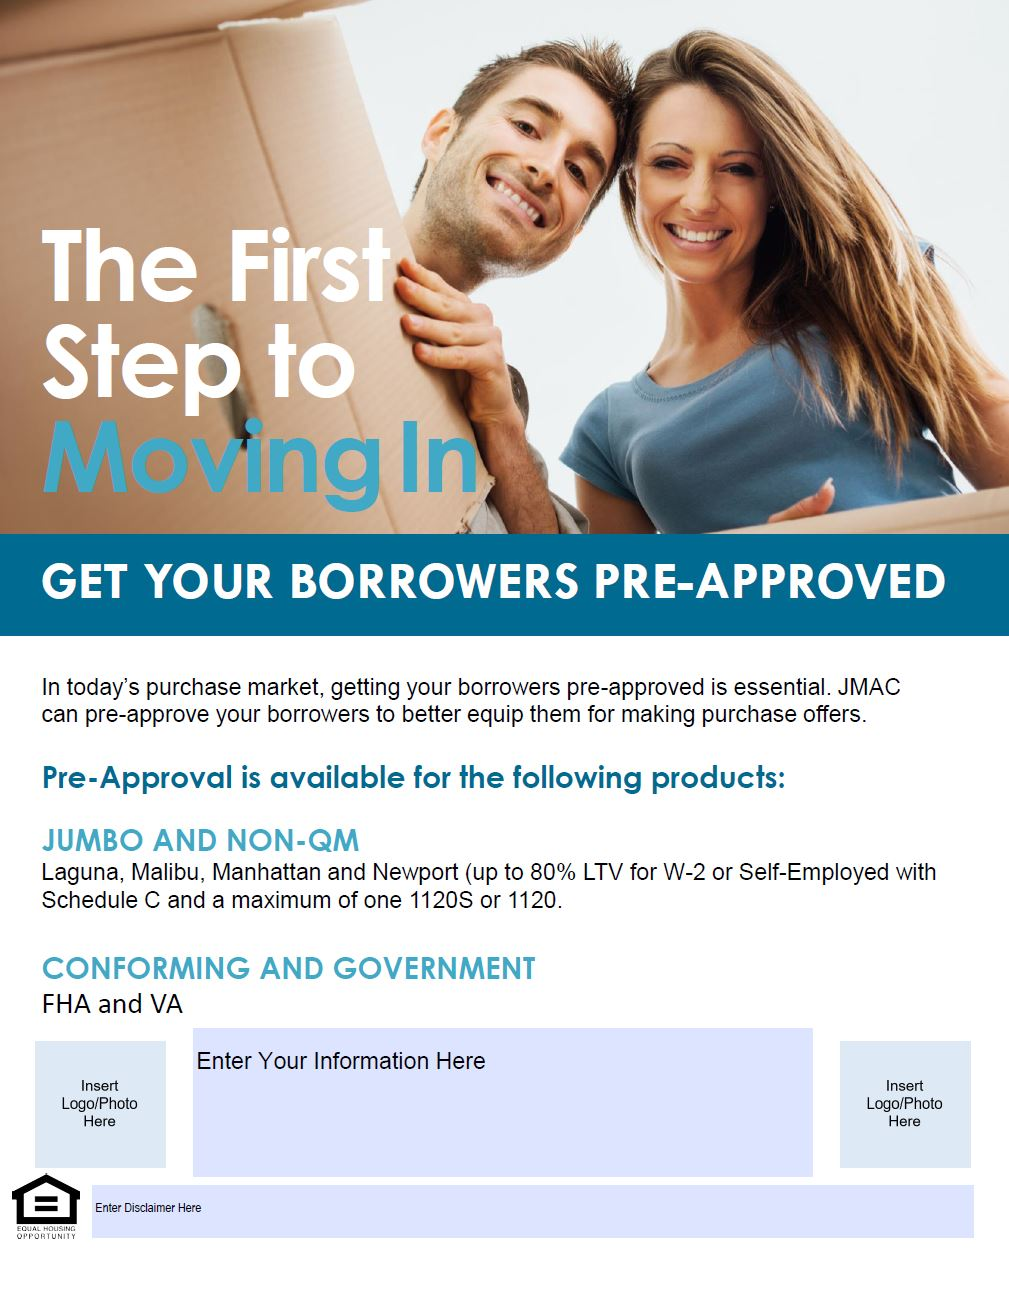 Pre Approval Marketing Flyer 10.18 Broker Fillable.JPG